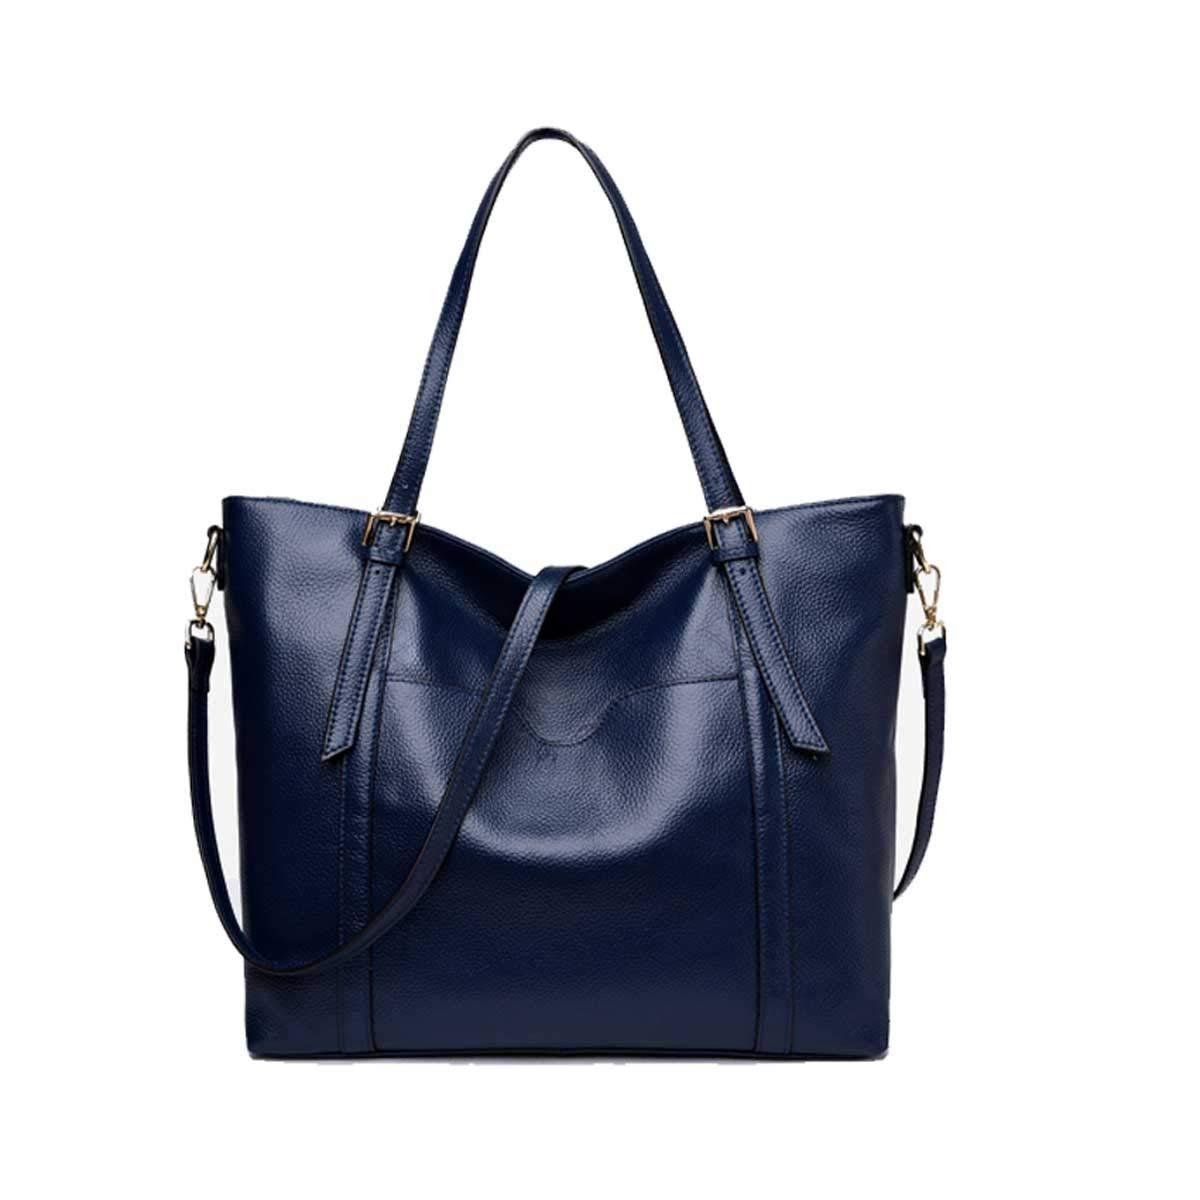 TUBACKPACK Soft Genuine Cow Leather Shoulder Handbags Womens Satchel Bag Tote Purse